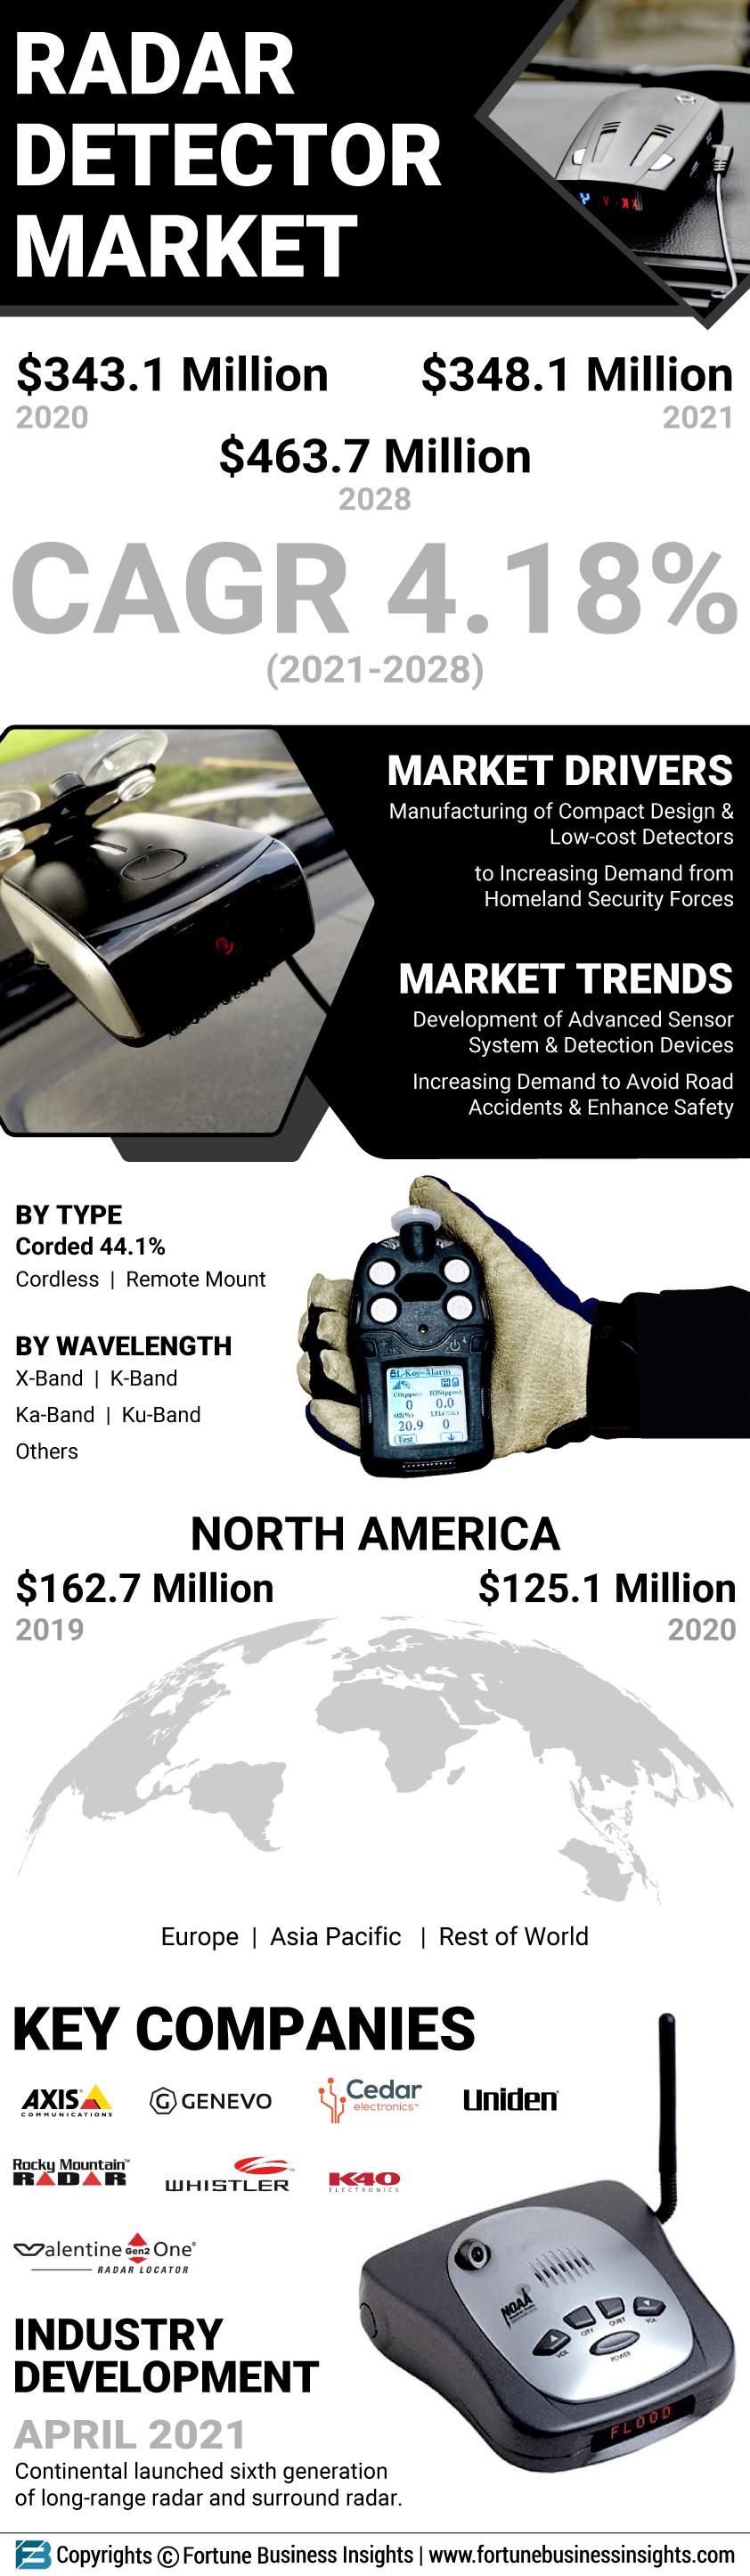 Radar Detector market